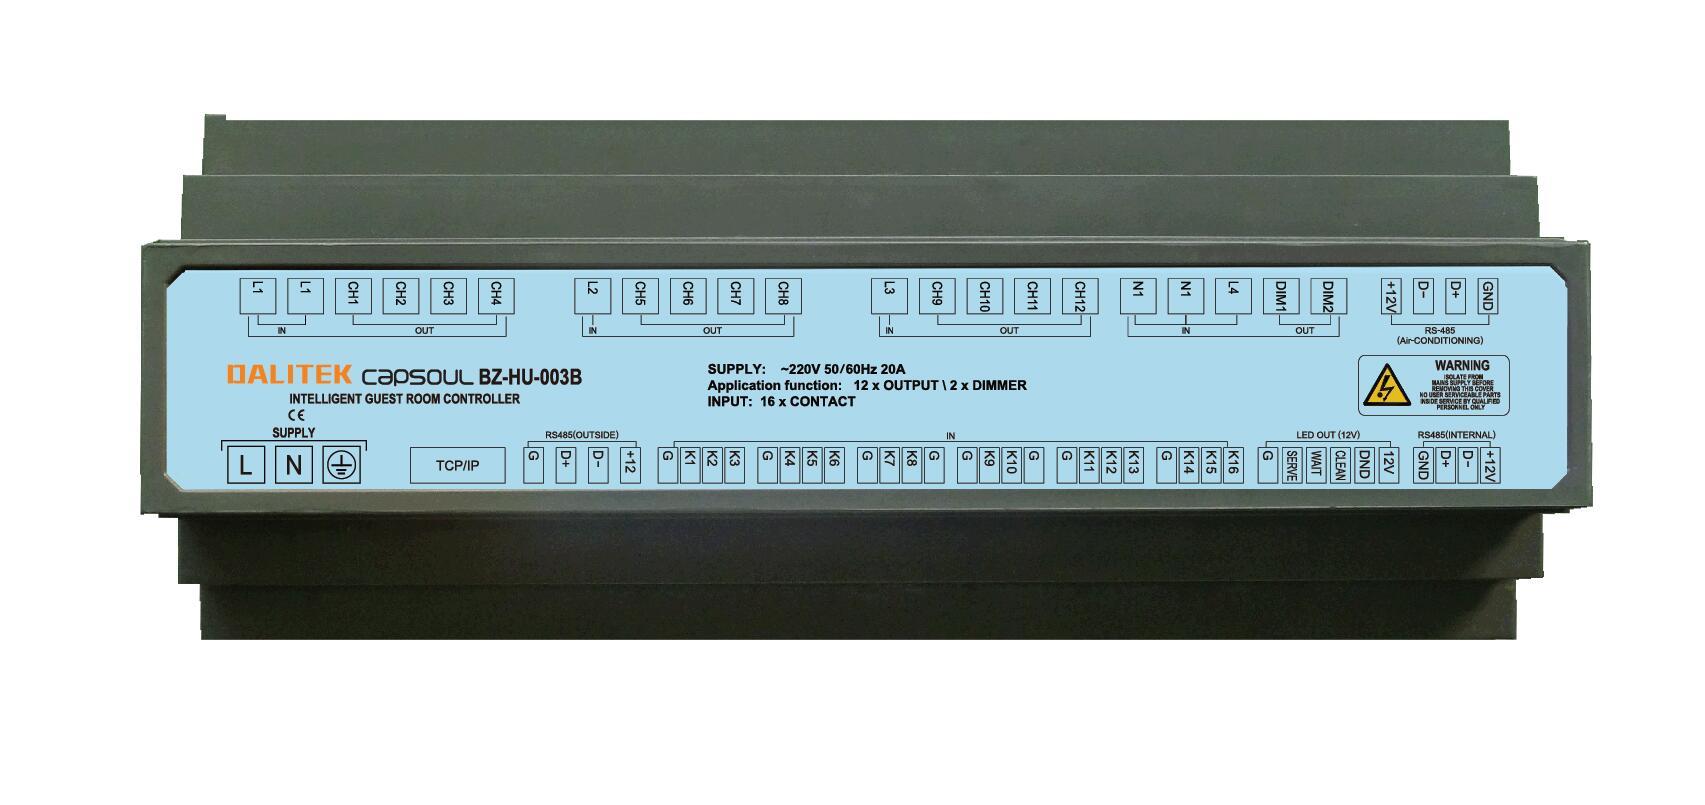 BZ-HU003B 智能客房灯光控制模块